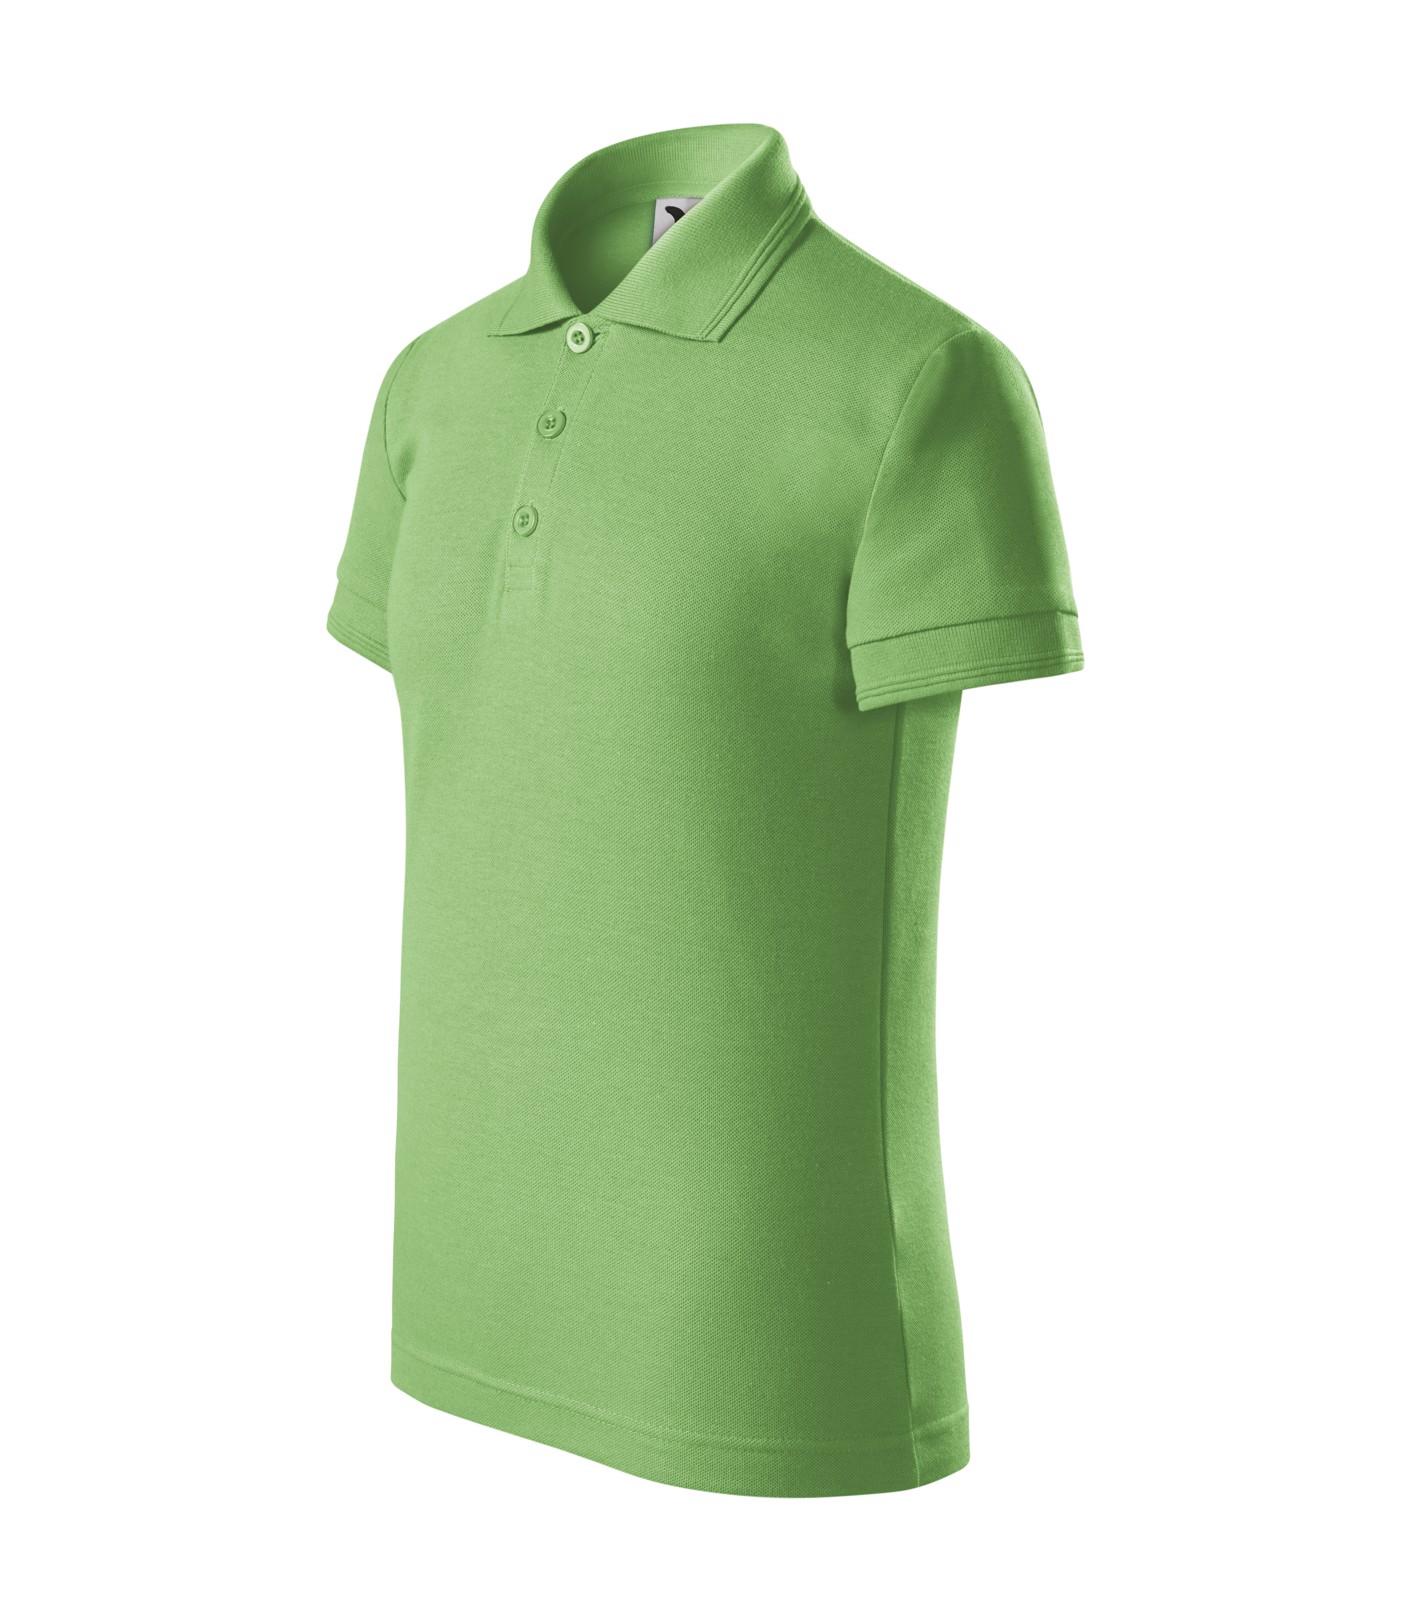 Polo Shirt Kids Malfini Pique Polo - Grass Green / 8 years